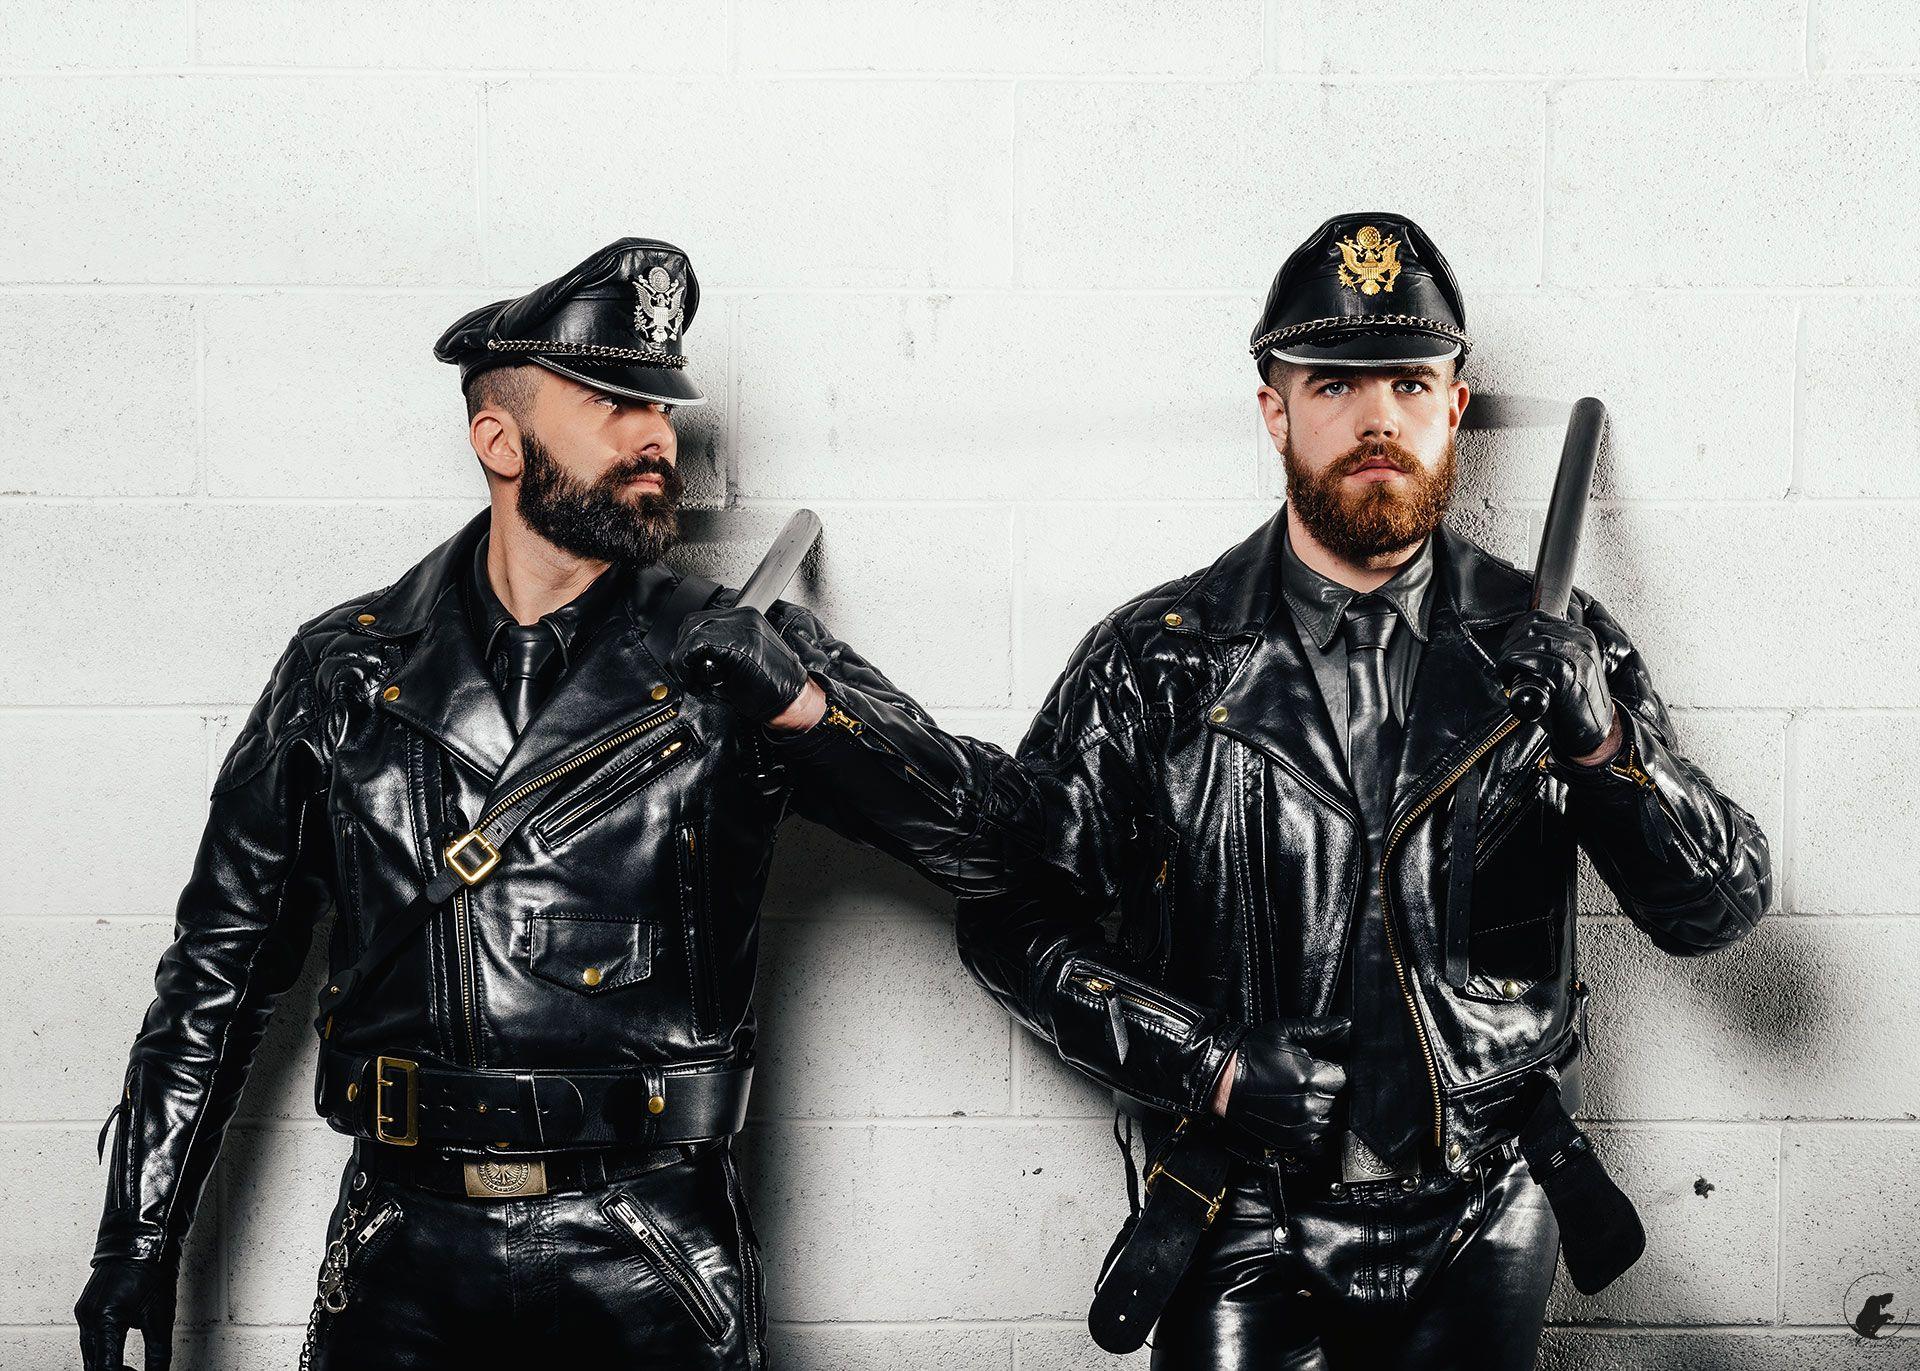 Black leather uniform gloves - Hot Cops Perfect Beard Leather Men Black Leather Uniform Gloves Bears